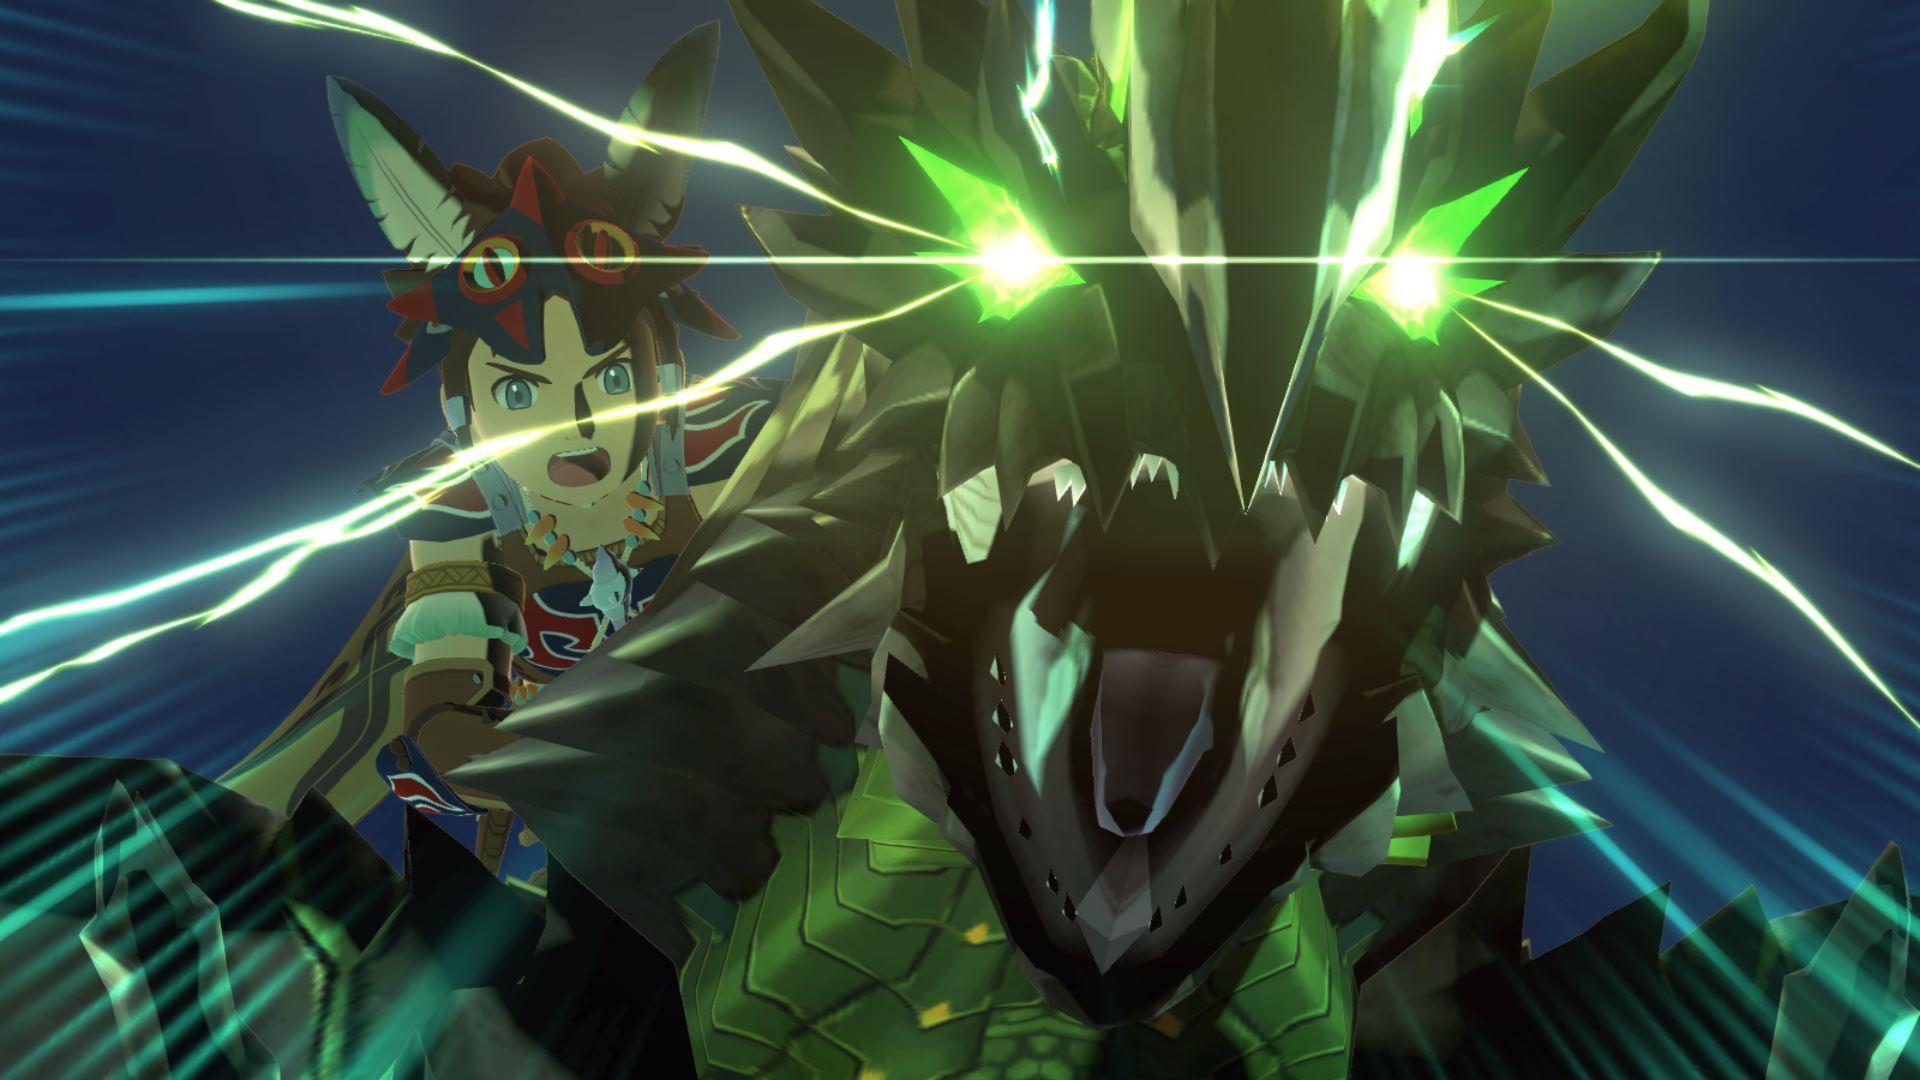 Riders take to battle on their favorite Monsties in Monster Hunter Stories 2: Wings of Ruin.